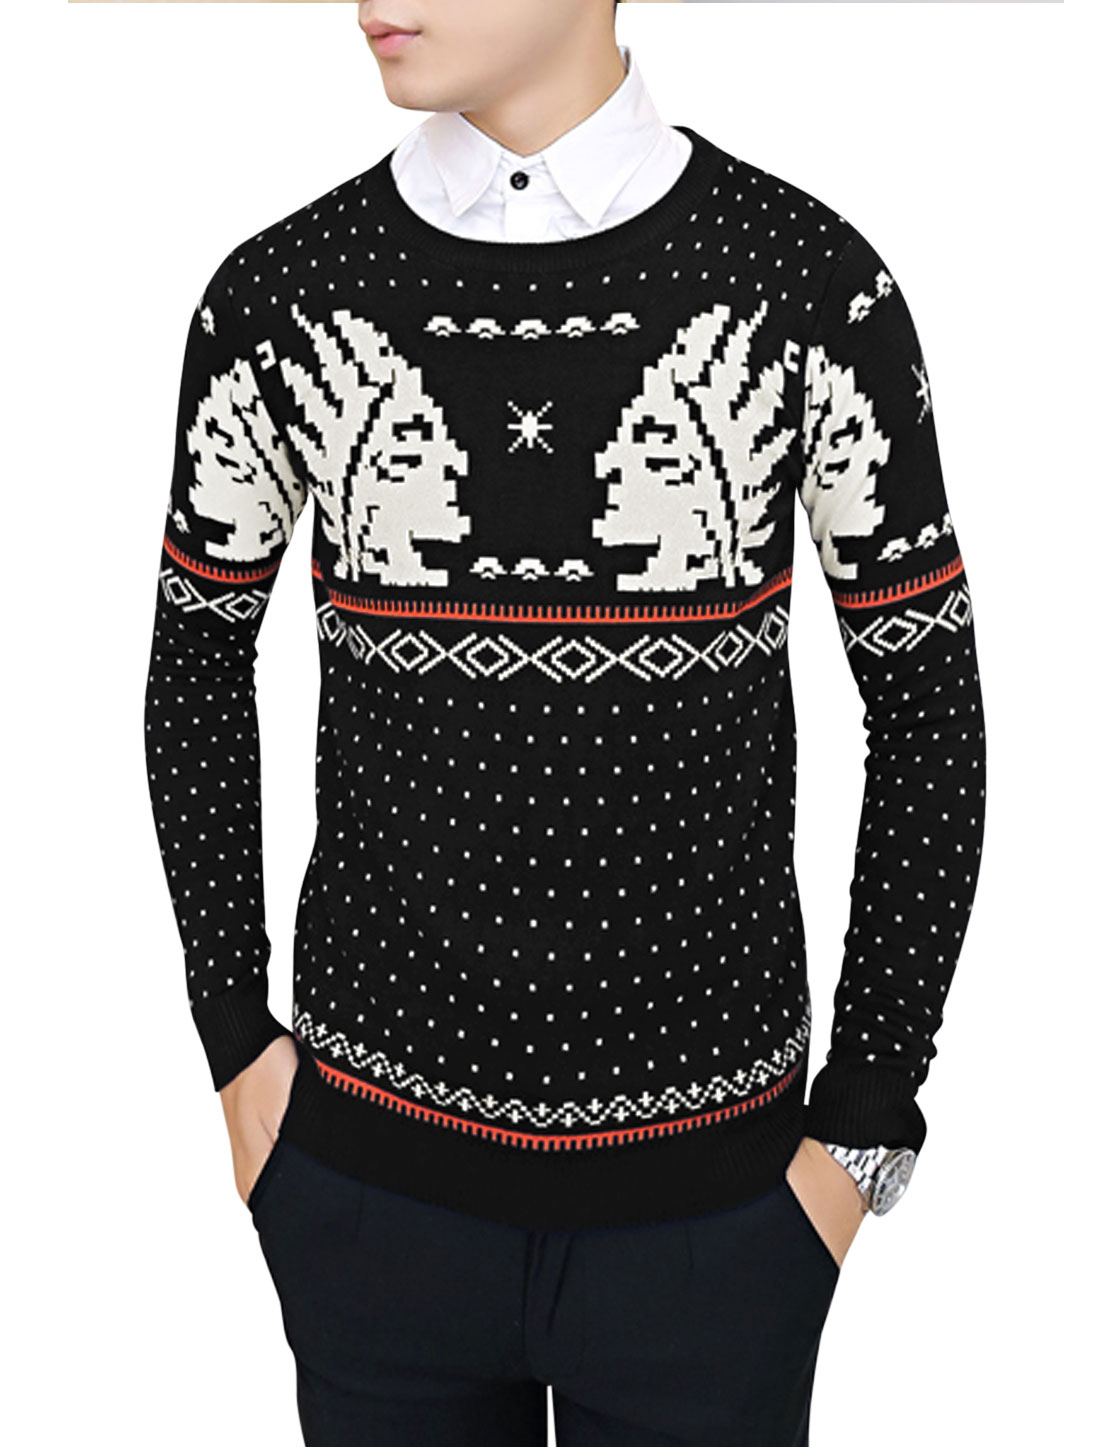 Men Pullover Geometric Portrait Pattern Casual Knit Shirt Black S